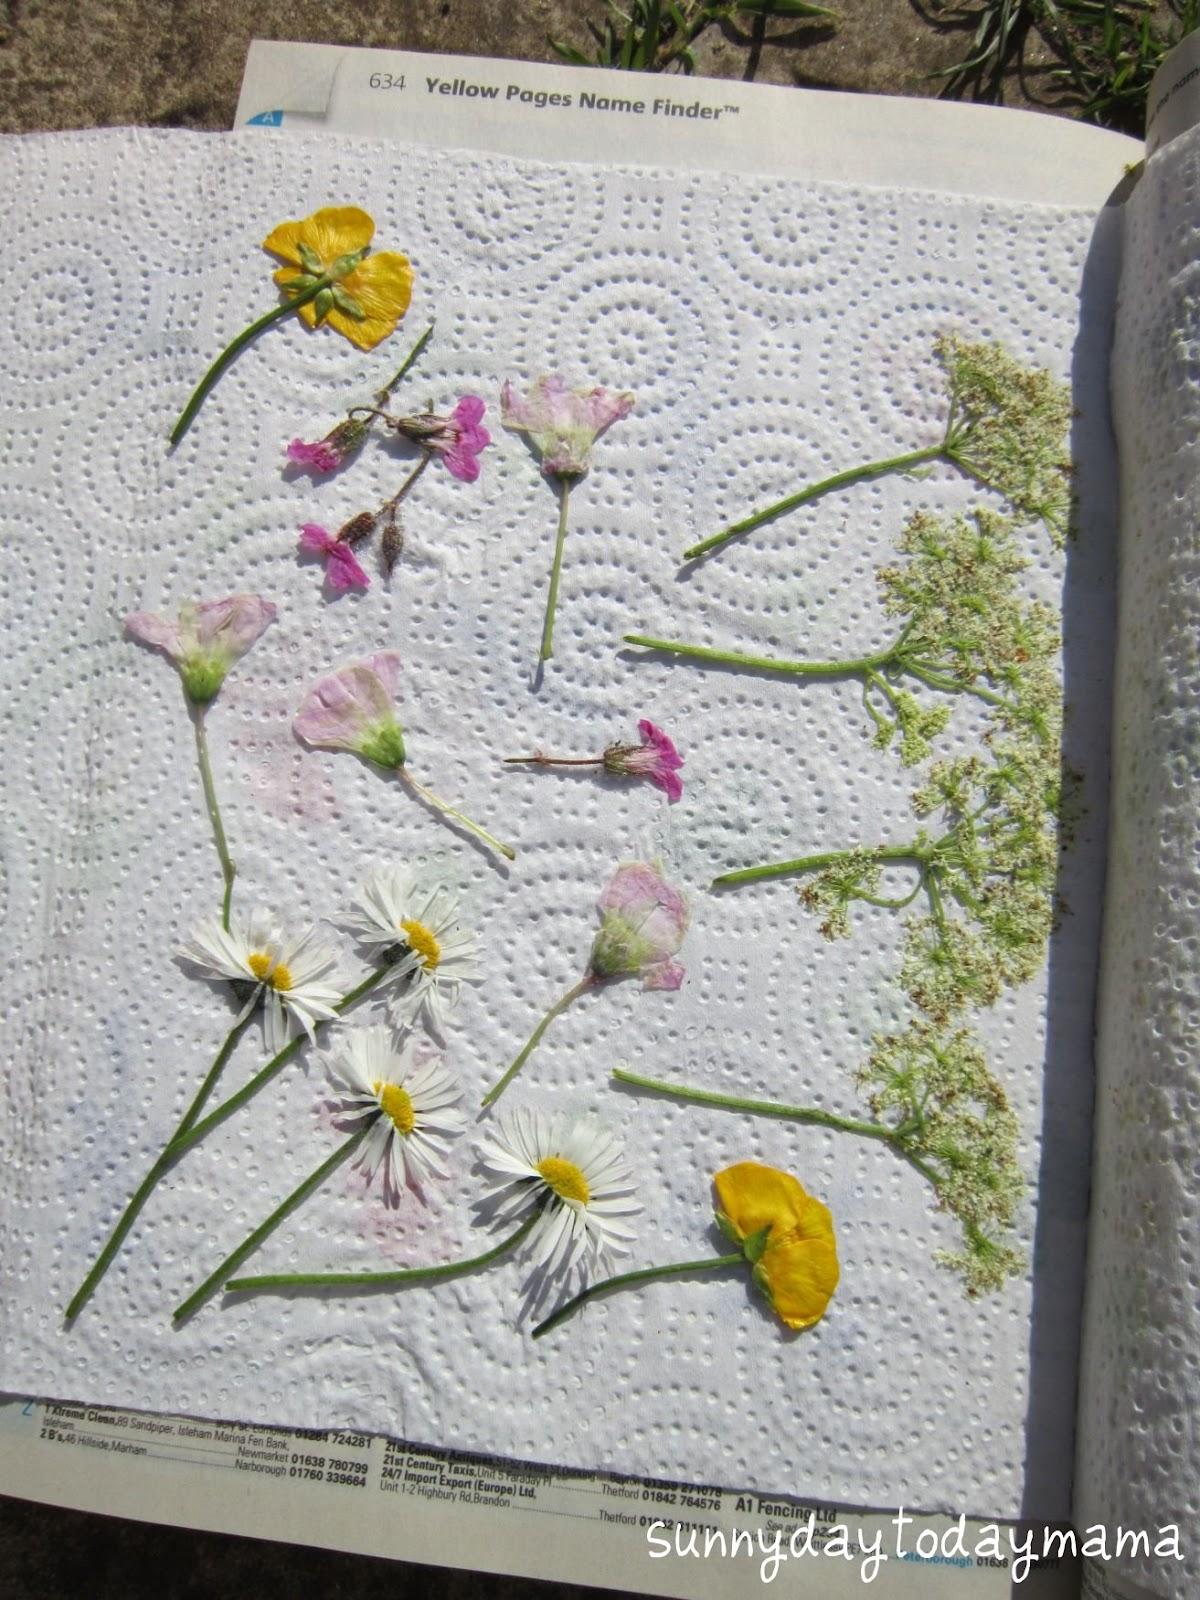 sunnydaytodaymama Homemade pressed flower keyrings